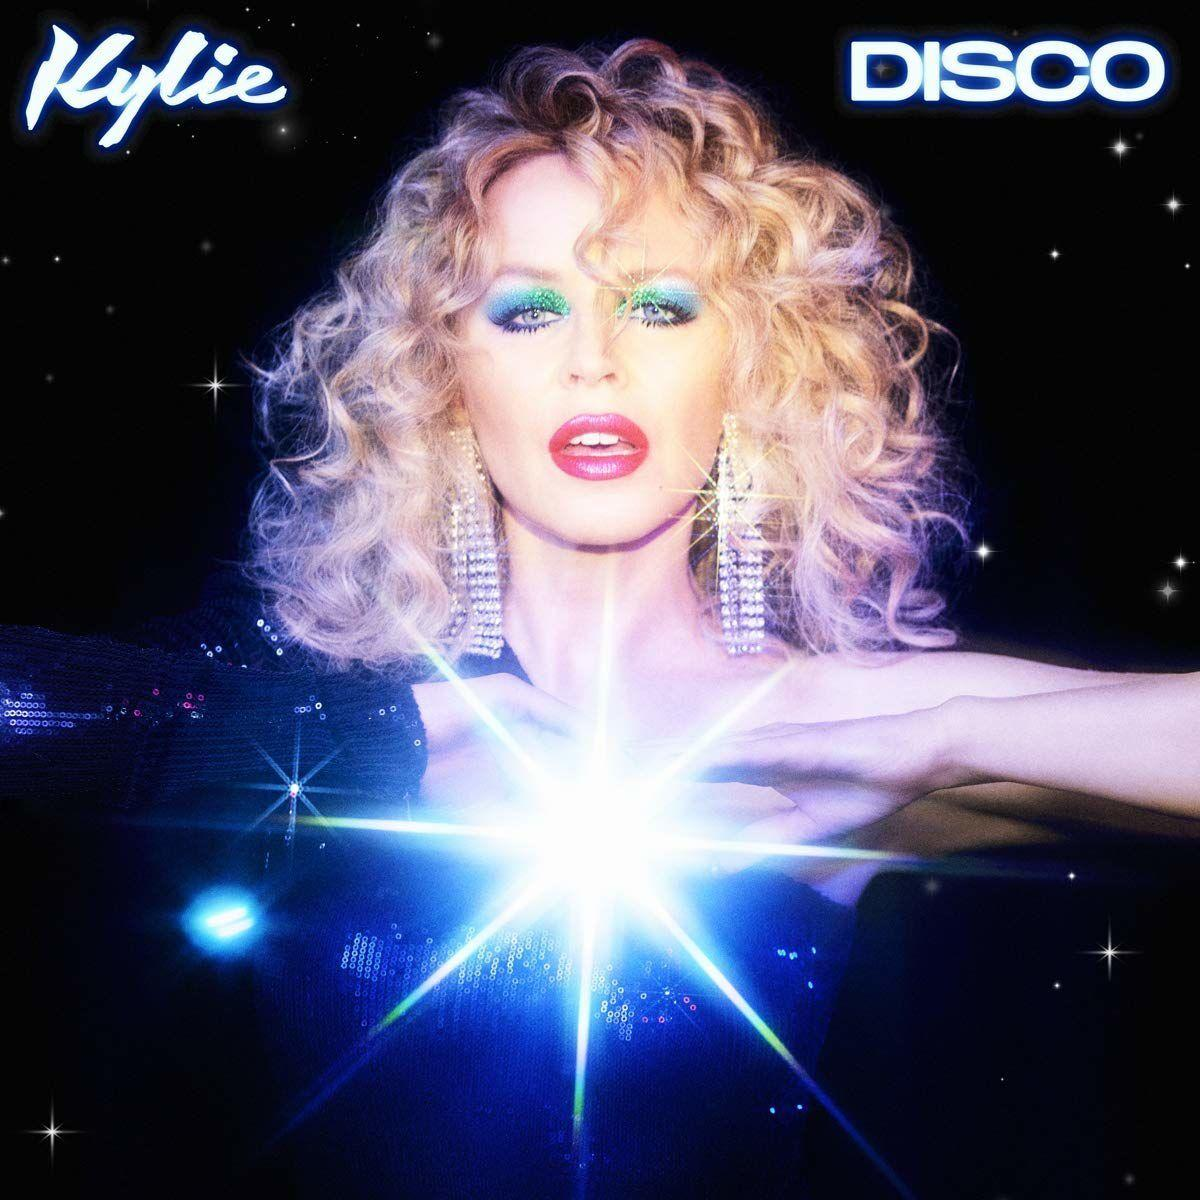 KylieMinogueDisco.jpg